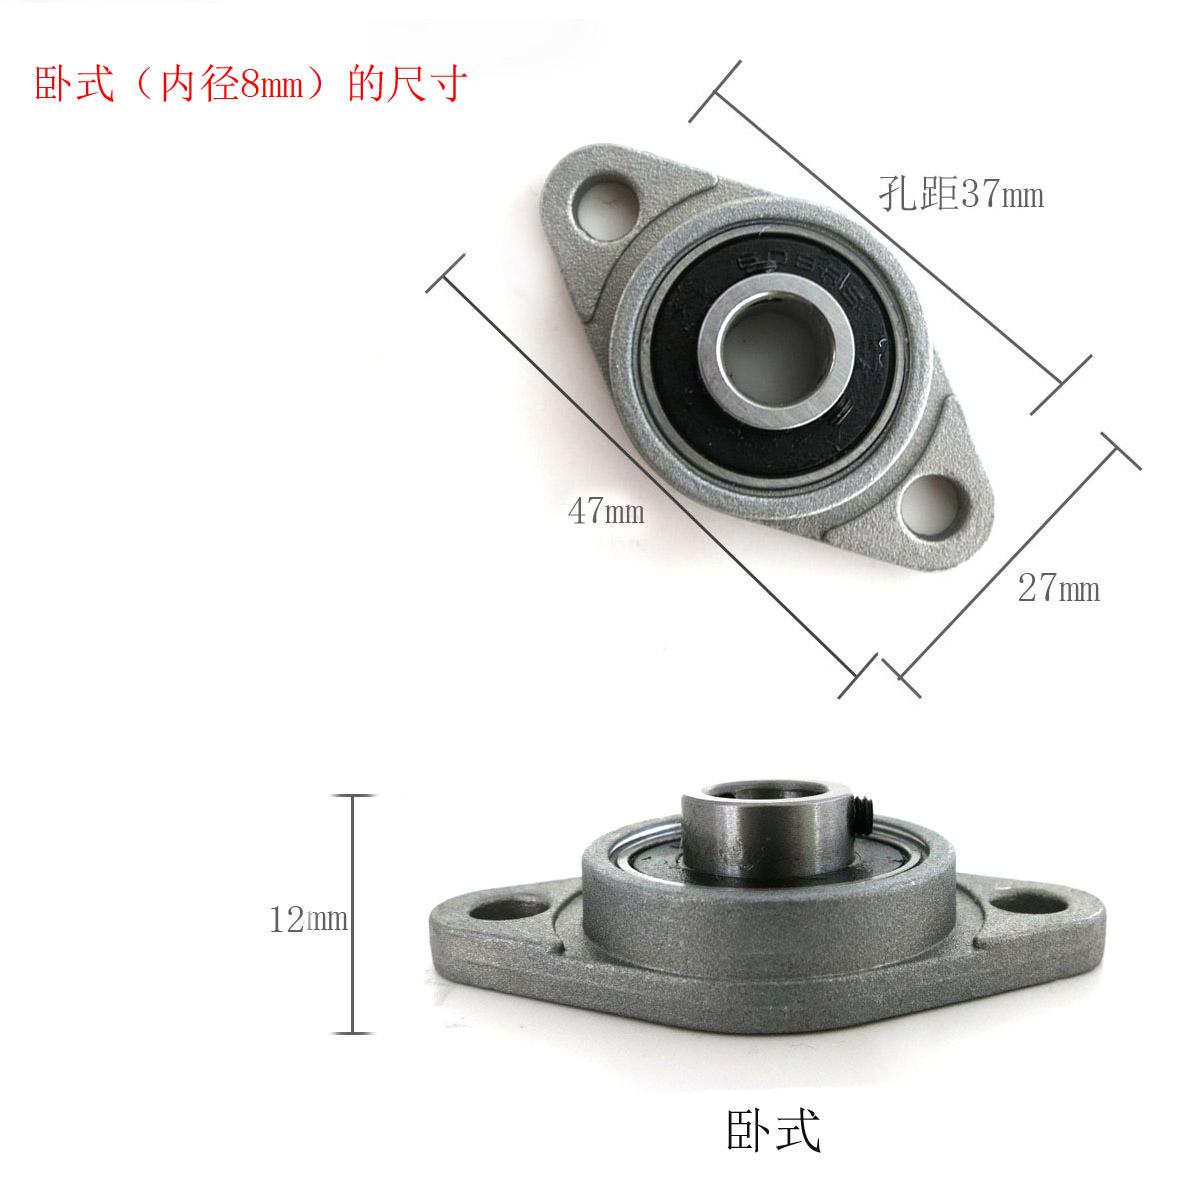 Horizontal Bearing 8mm Ball Bracket Lead Screw T8 2 D8 300mm 3d Printer Plus Nut Diameter Length 45mm Thickness Height 27mm Weight 2716g Fixed Pitch 37mm Aperture 5mm